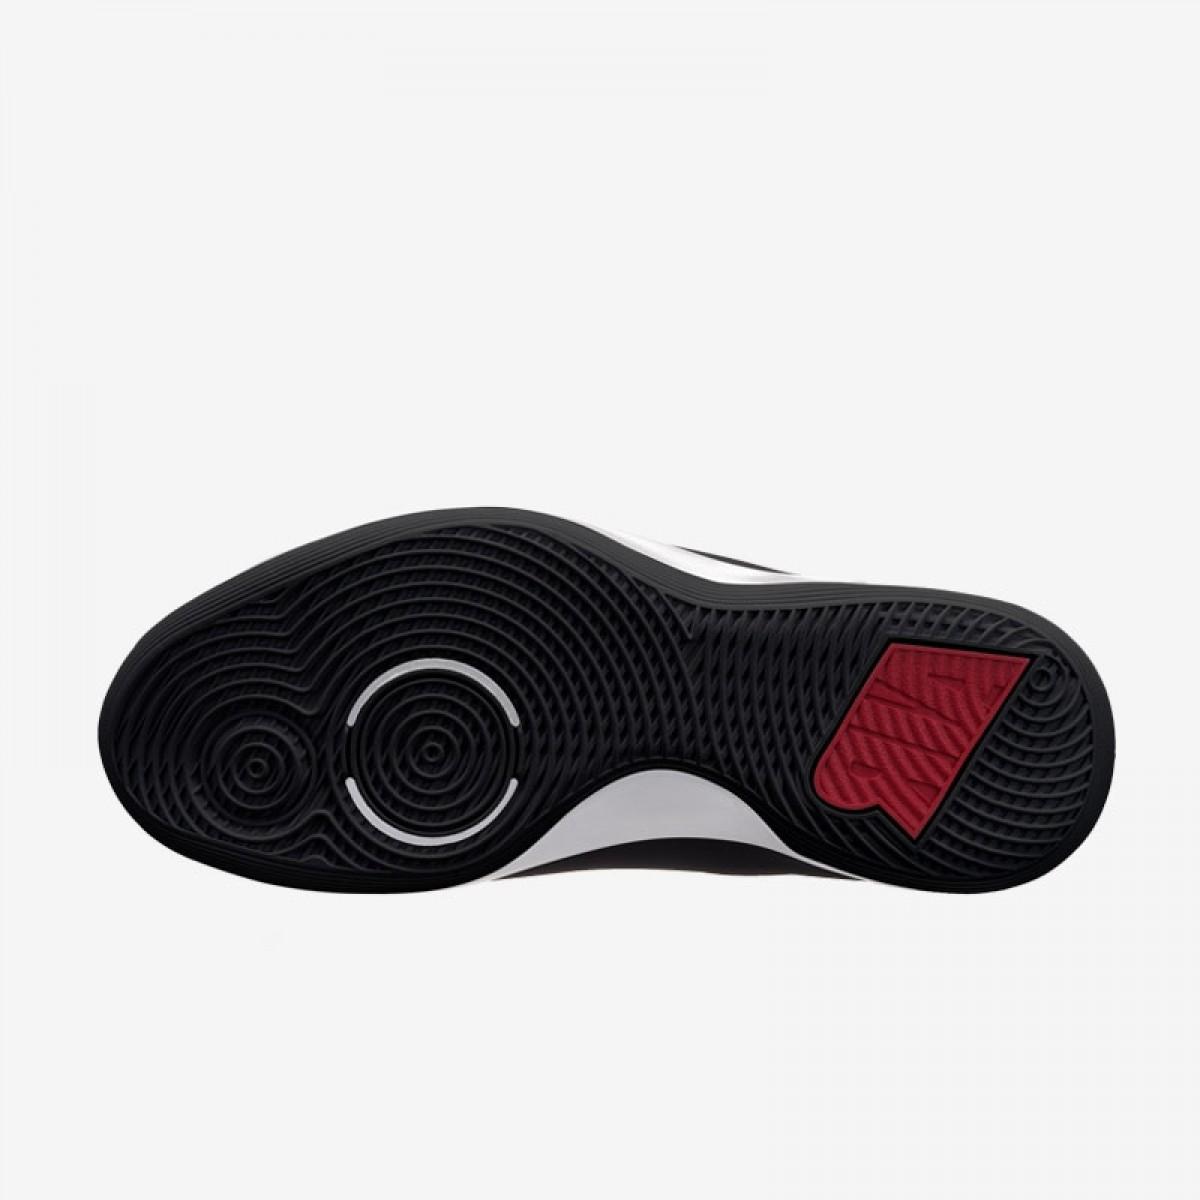 Nike Air Versitile III 'Bred' AO4430-006